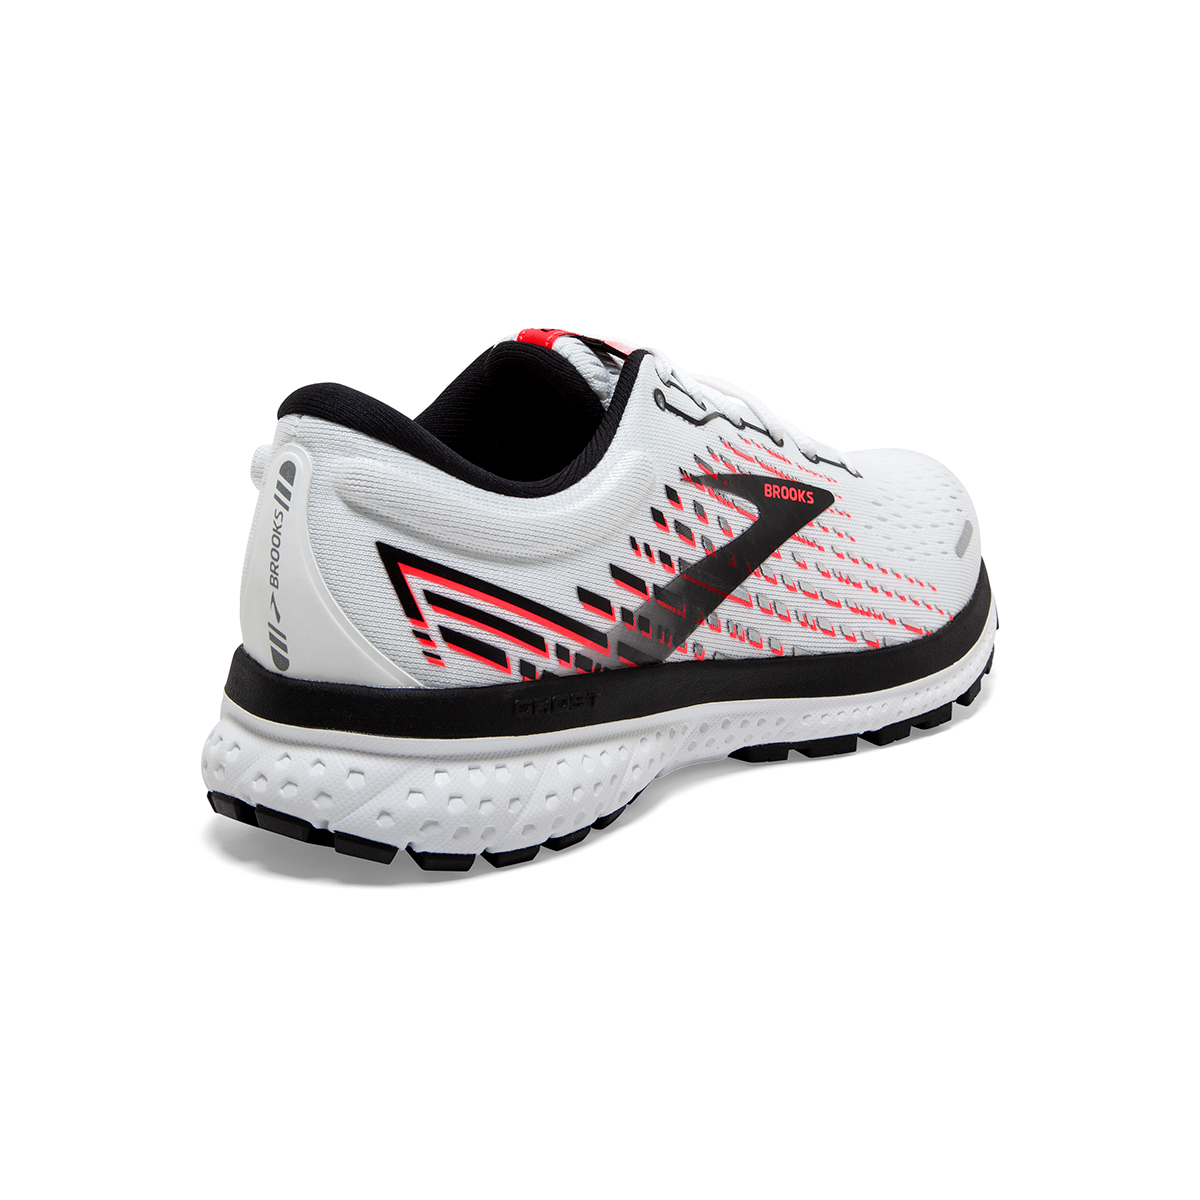 Women's Brooks Ghost 13 Running Shoe - Color: White/Pink/Black - Size: 5 - Width: Regular, White/Pink/Black, large, image 6